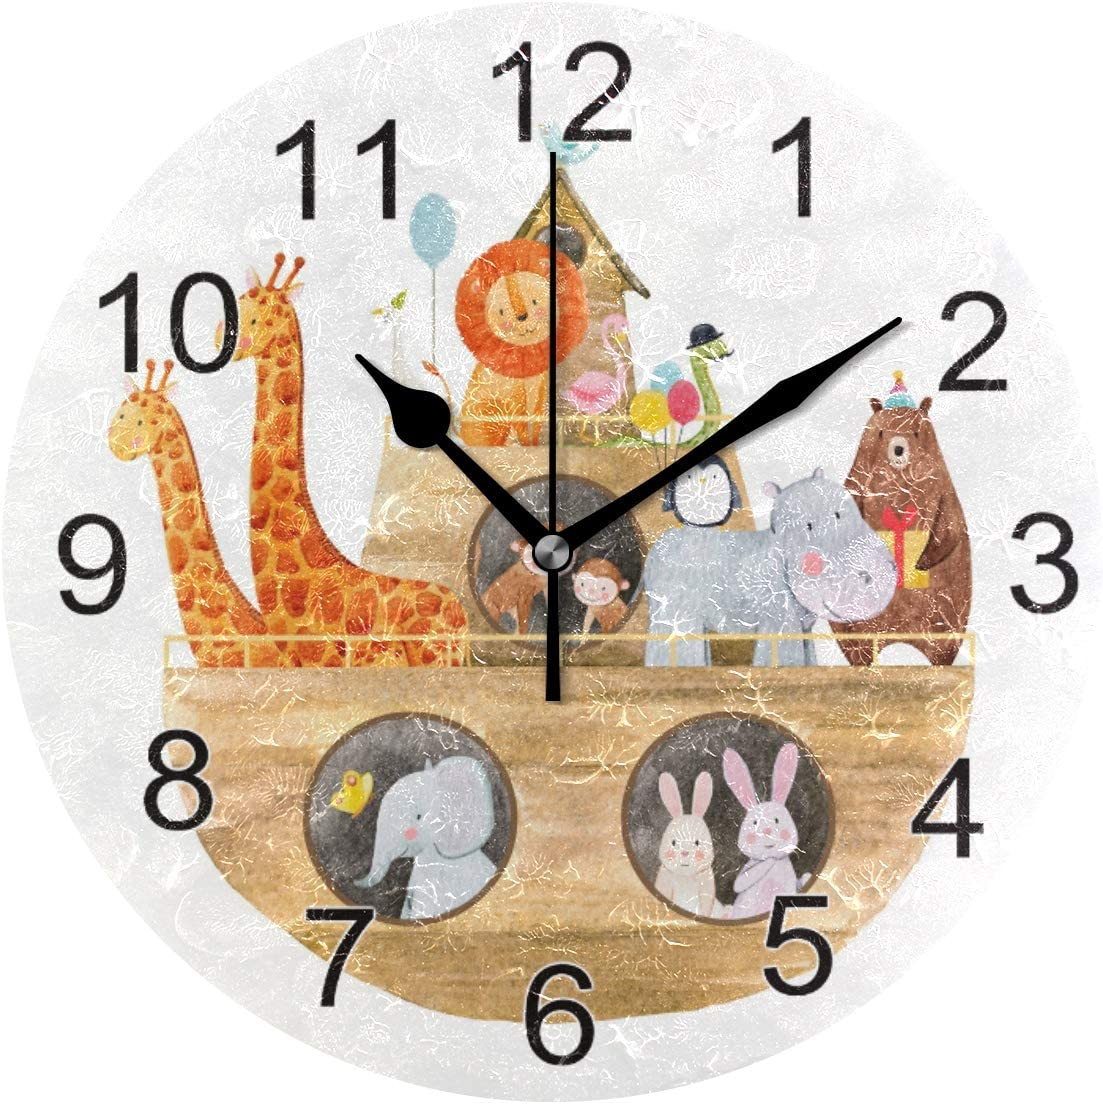 Exnundod Animal Noah's Ark Wall Clock, 9.5In Lion Giraffe Rabbit Desk Clock, Silent Non Ticking Clock, Home Decor for Kitchen Bedroom Office School Art